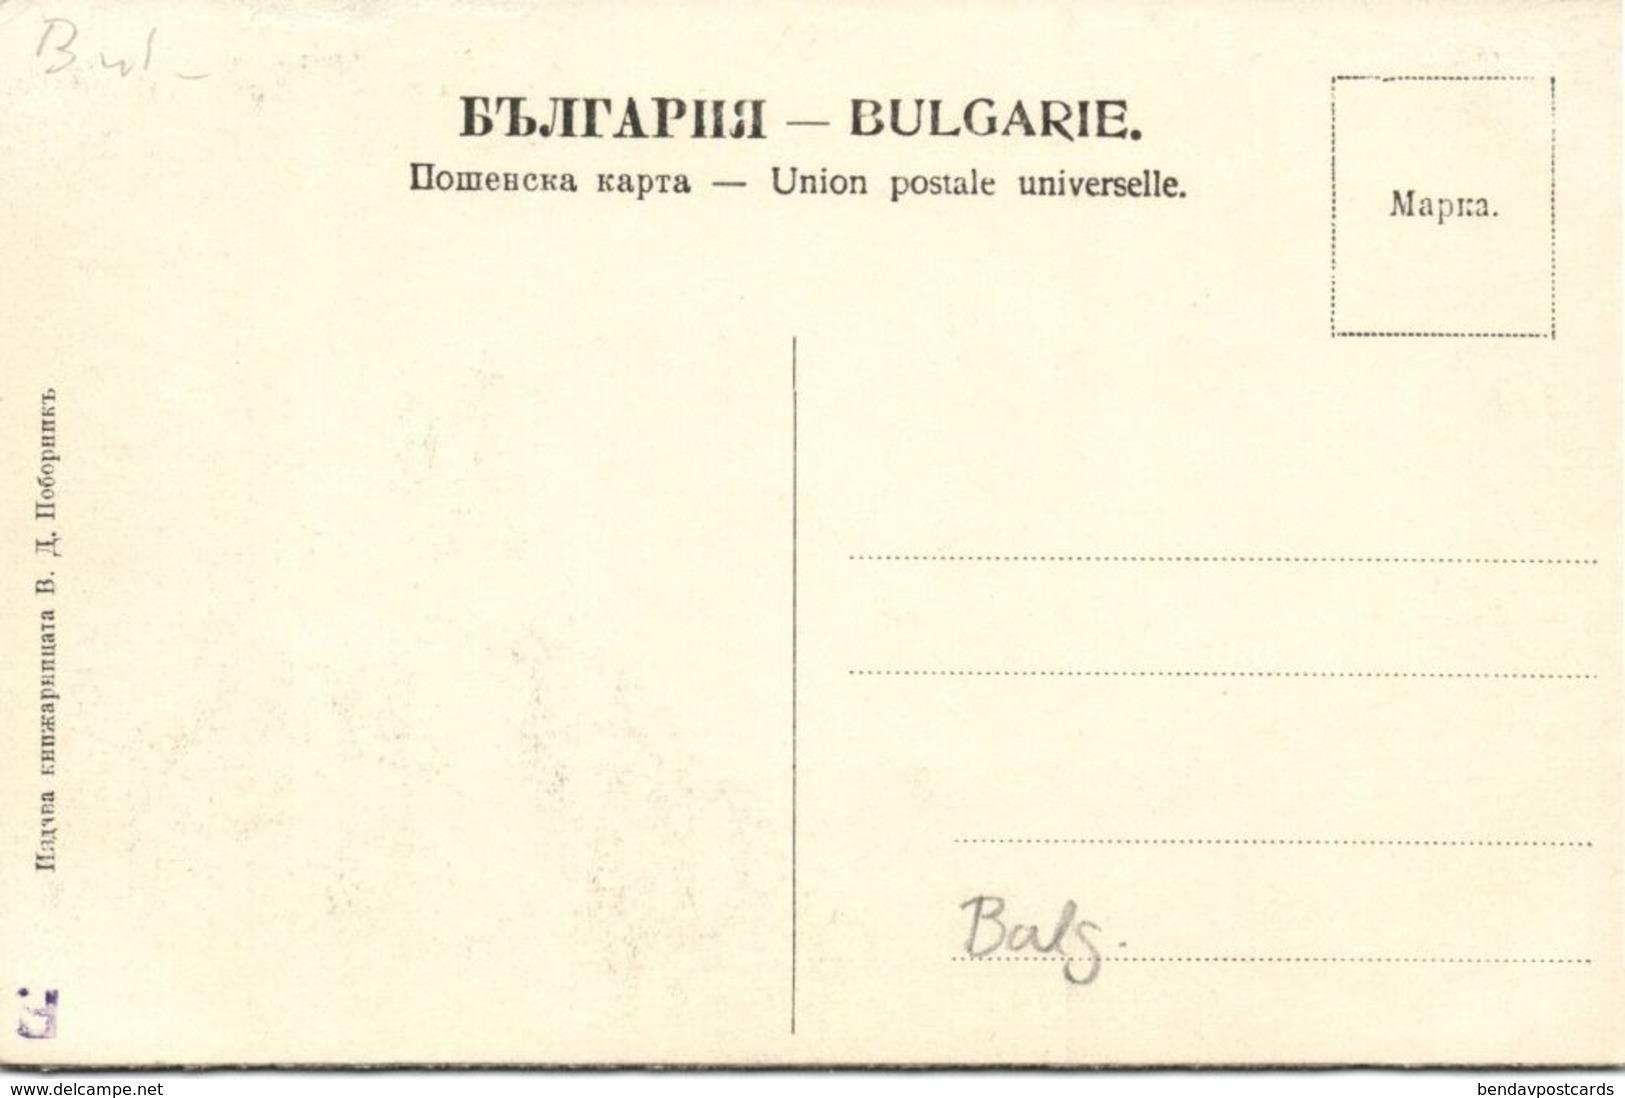 Bulgaria, KYUSTENDIL Кюстендил, Partial View (1910s) Postcard (5) - Bulgaria